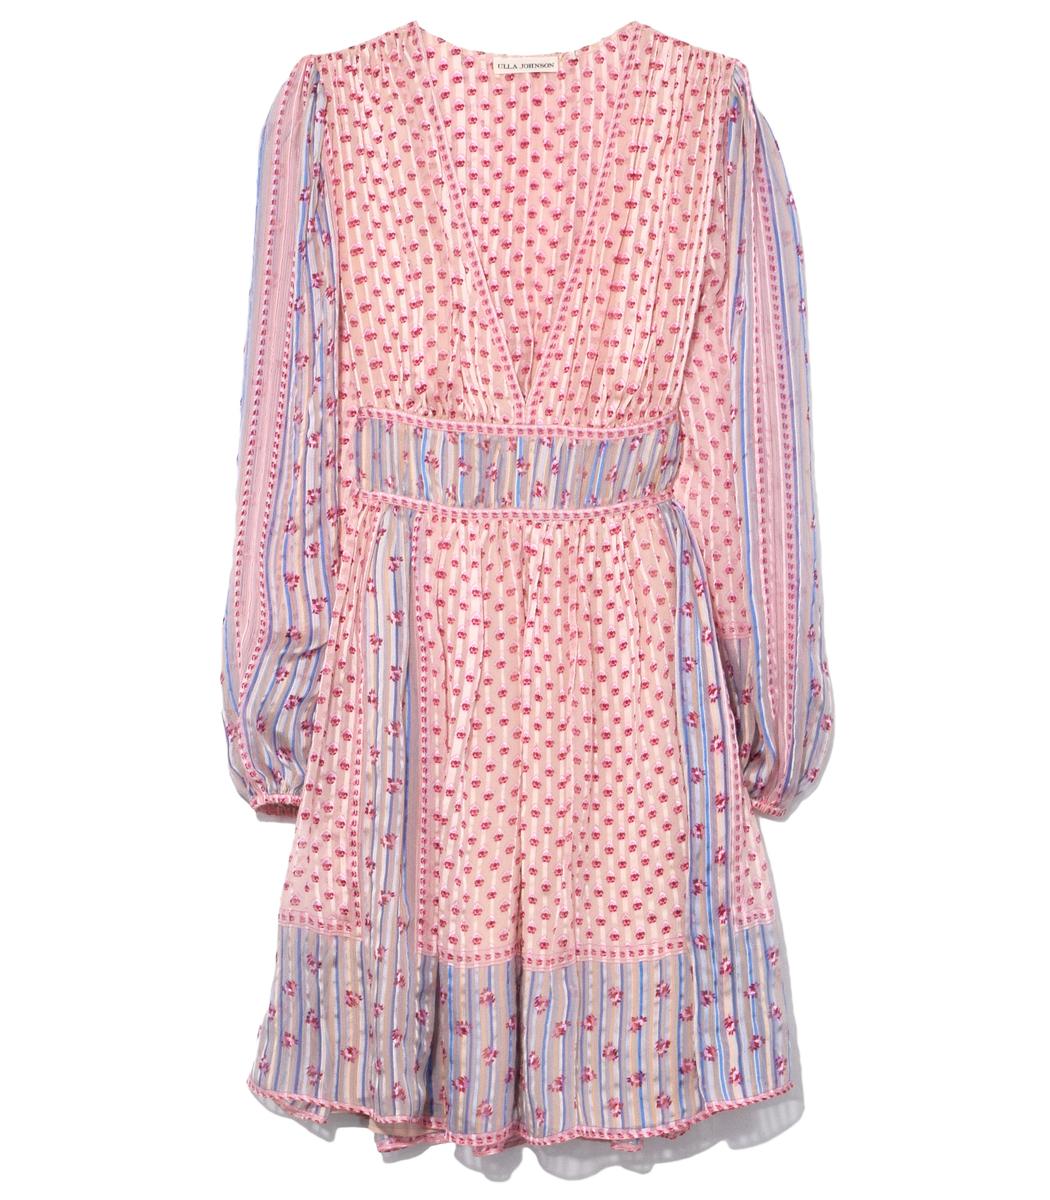 Martine short dress